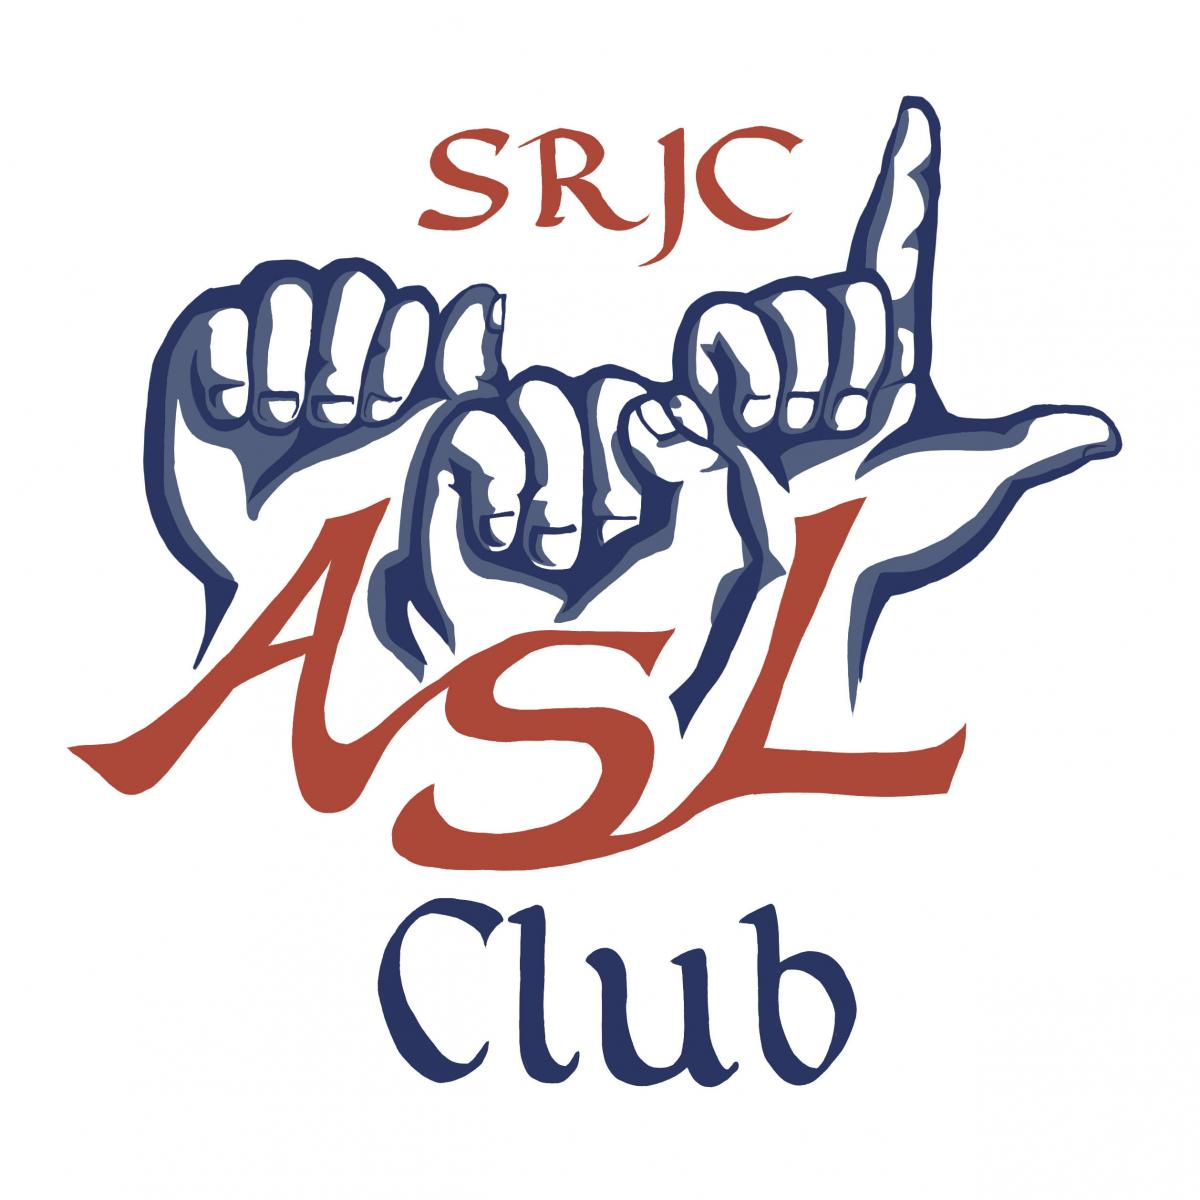 SRJC Club Logo